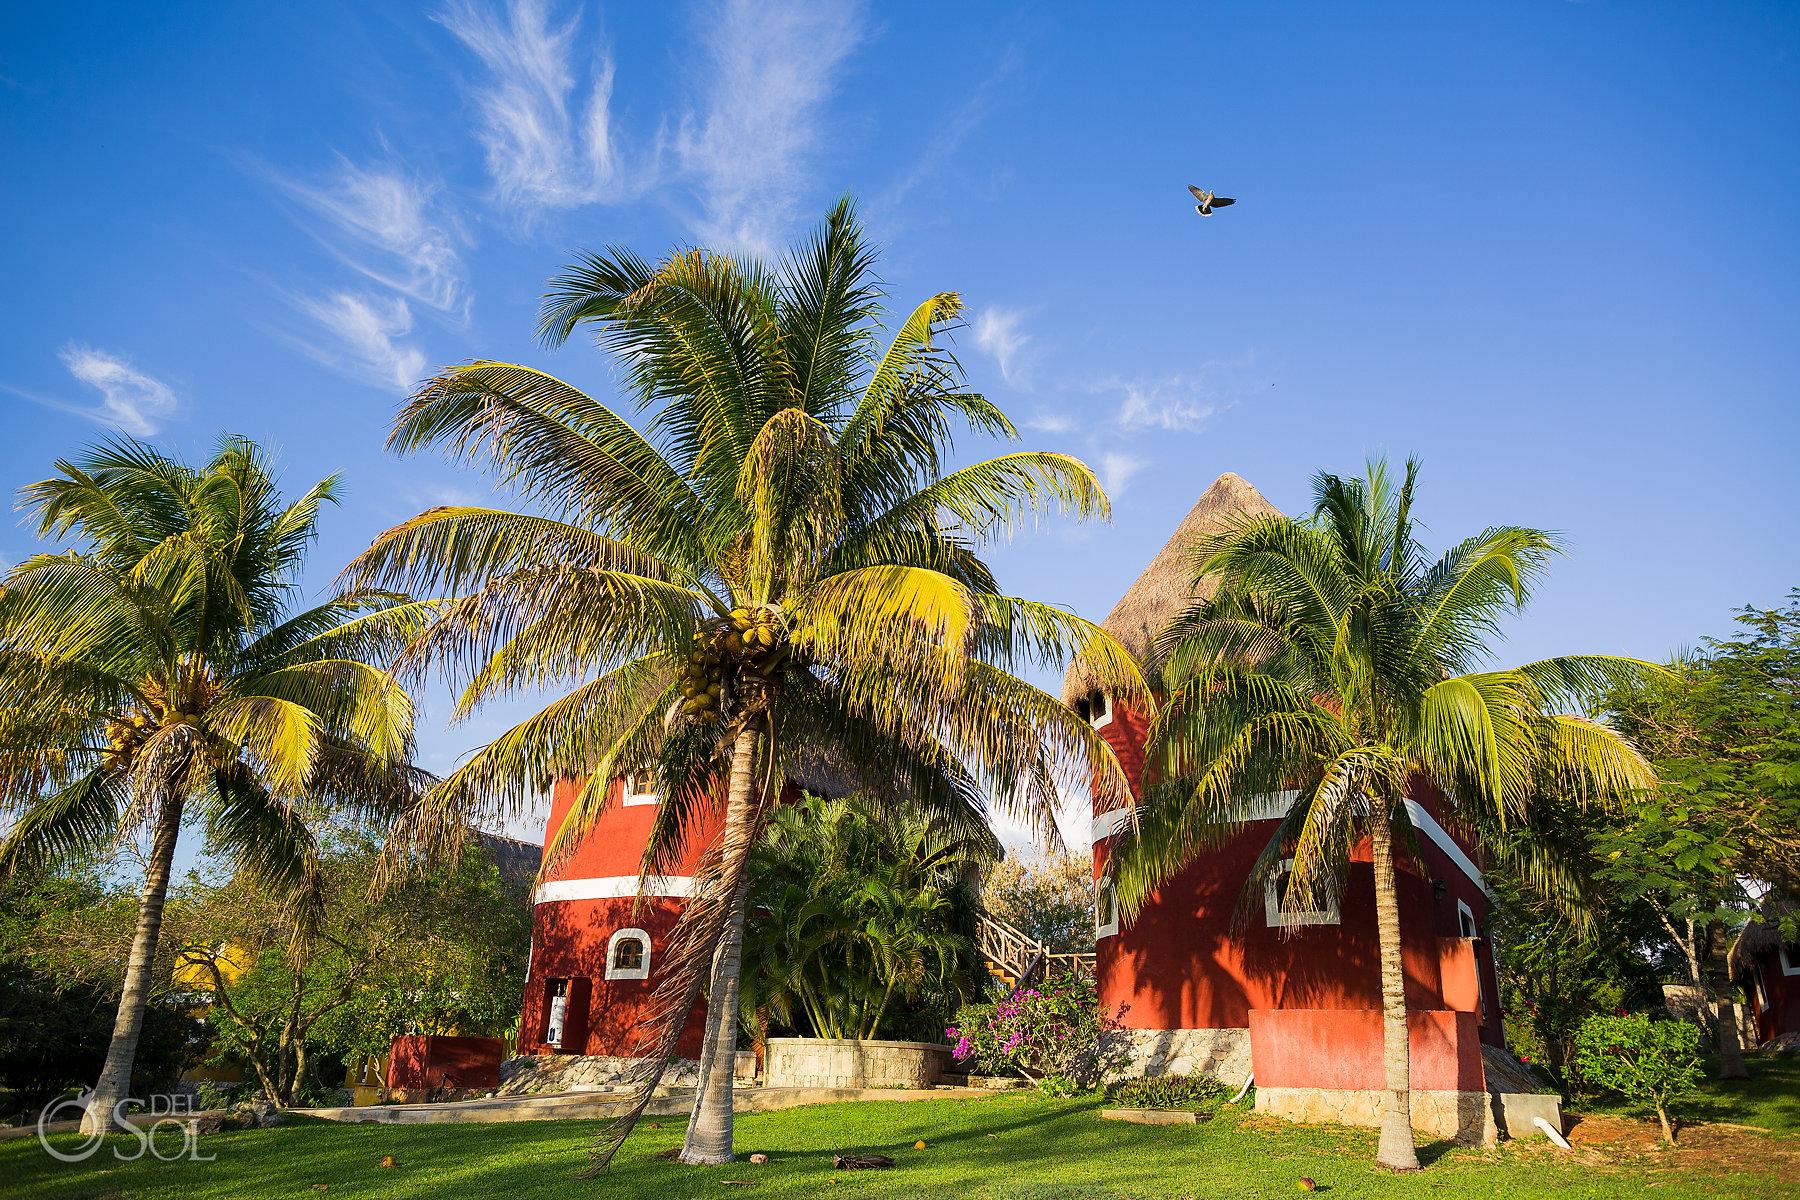 Yucatan Hacienda Four Element Birthday Experience